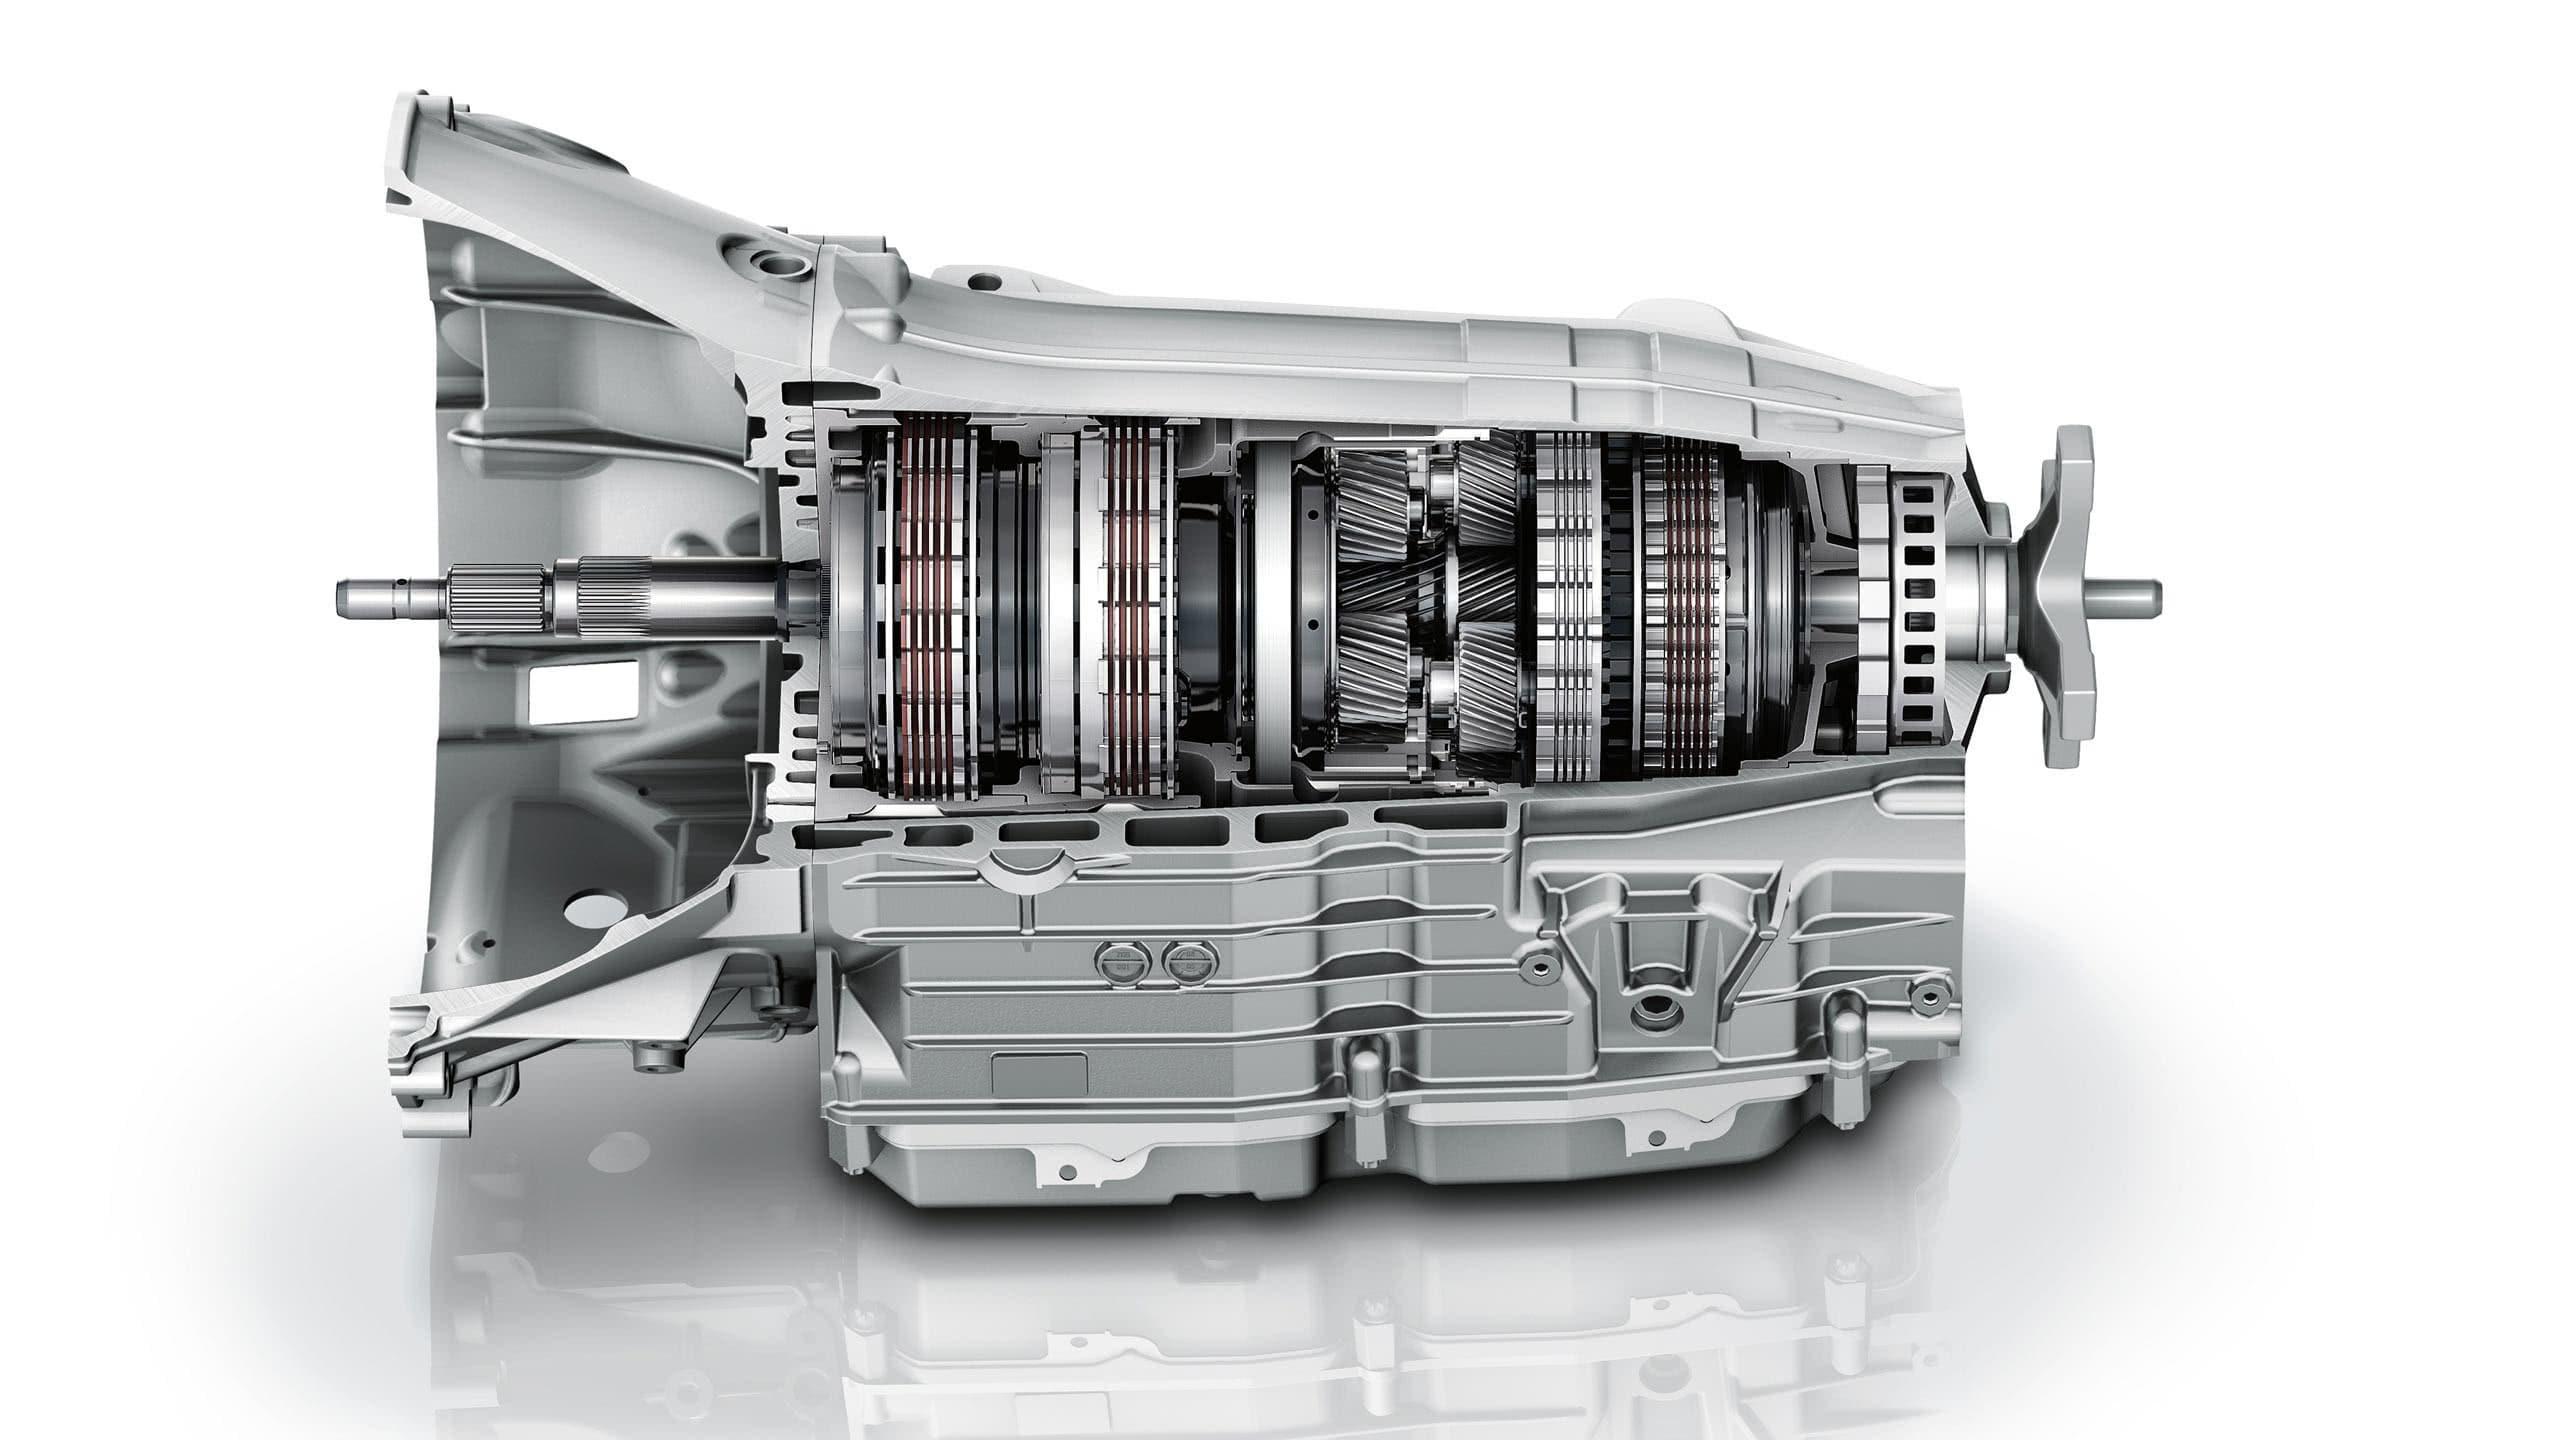 mercedes benz 9 speed transmission wqhd 1440p wallpaper